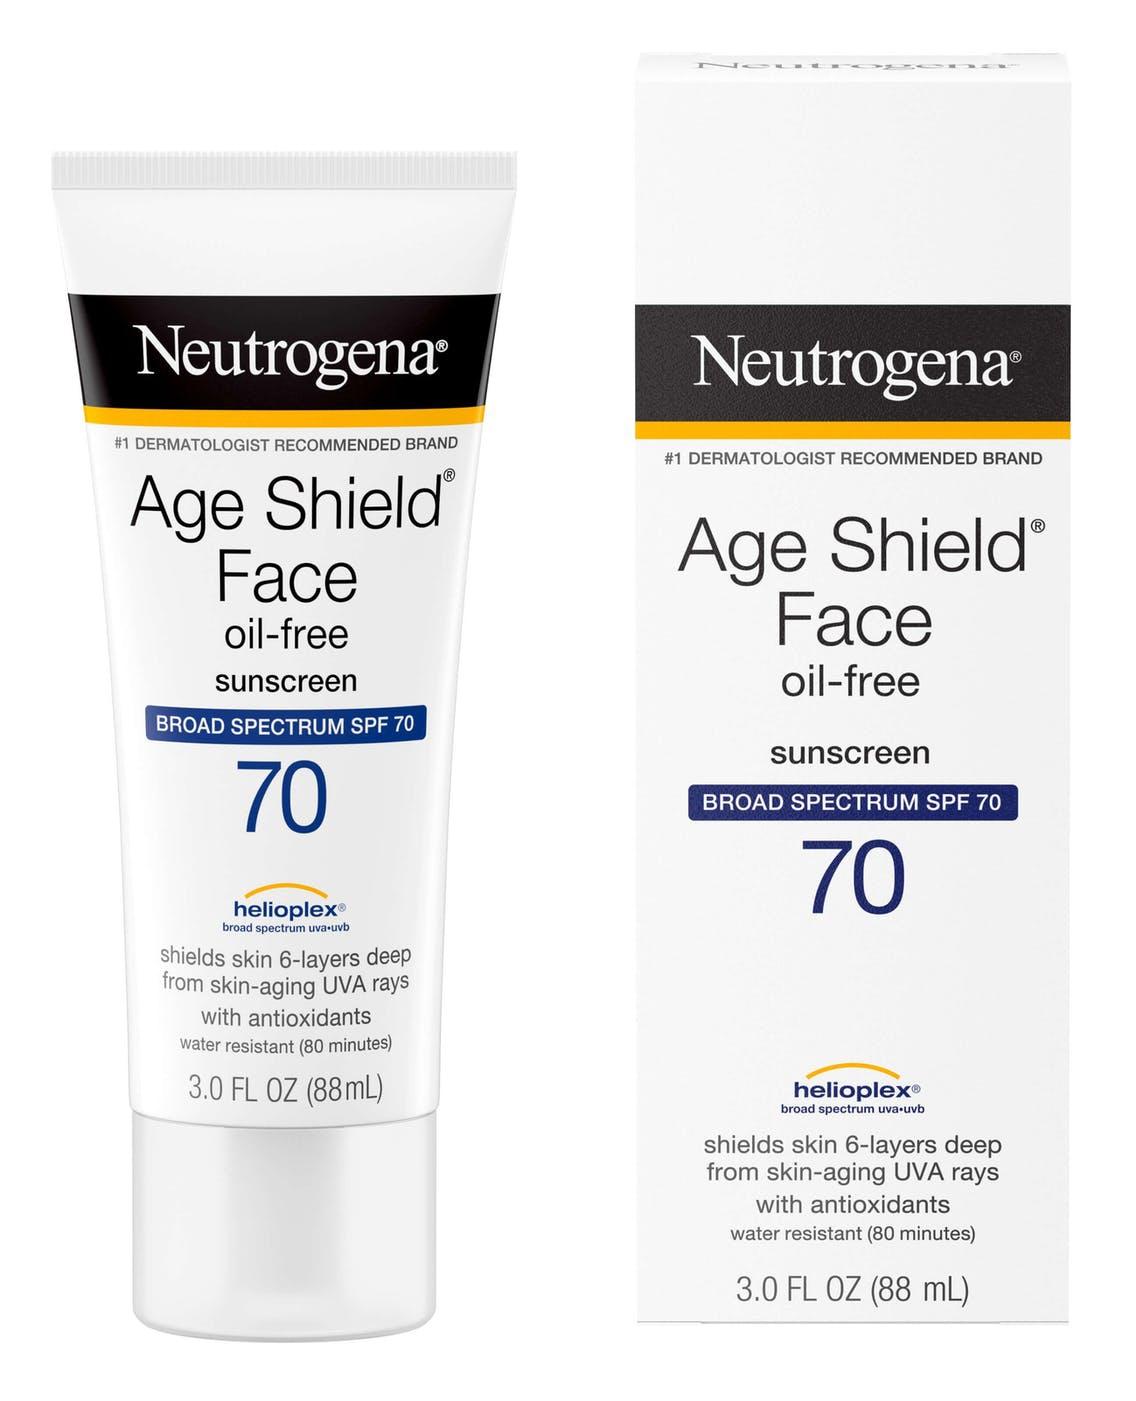 Neutrogena Age Shield Anti-Oxidant Face Lotion Sunscreen Broad Spectrum Spf 70